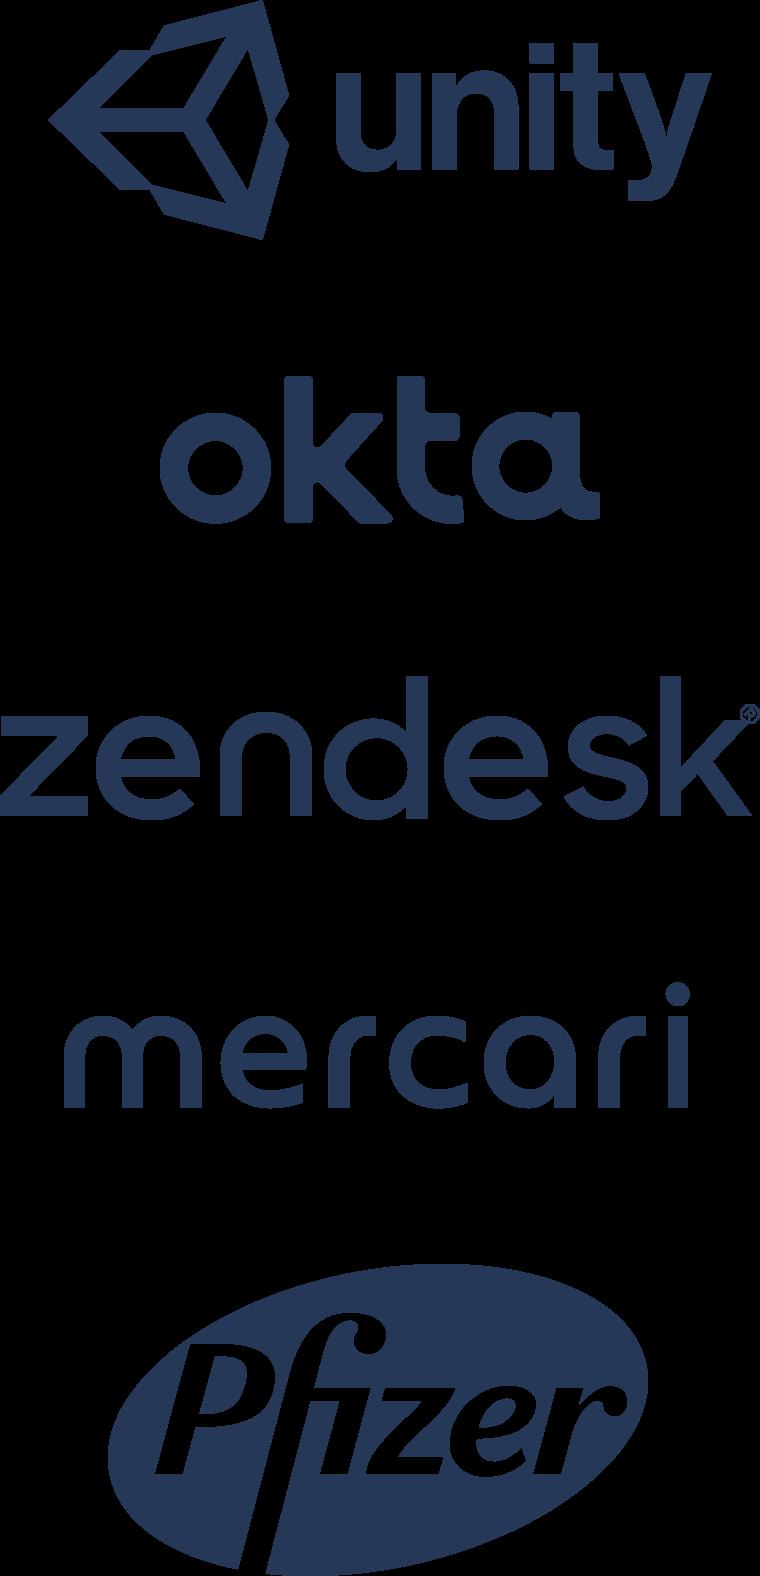 Unity, Okta, Zendesk, Mercari, Pfizer logos